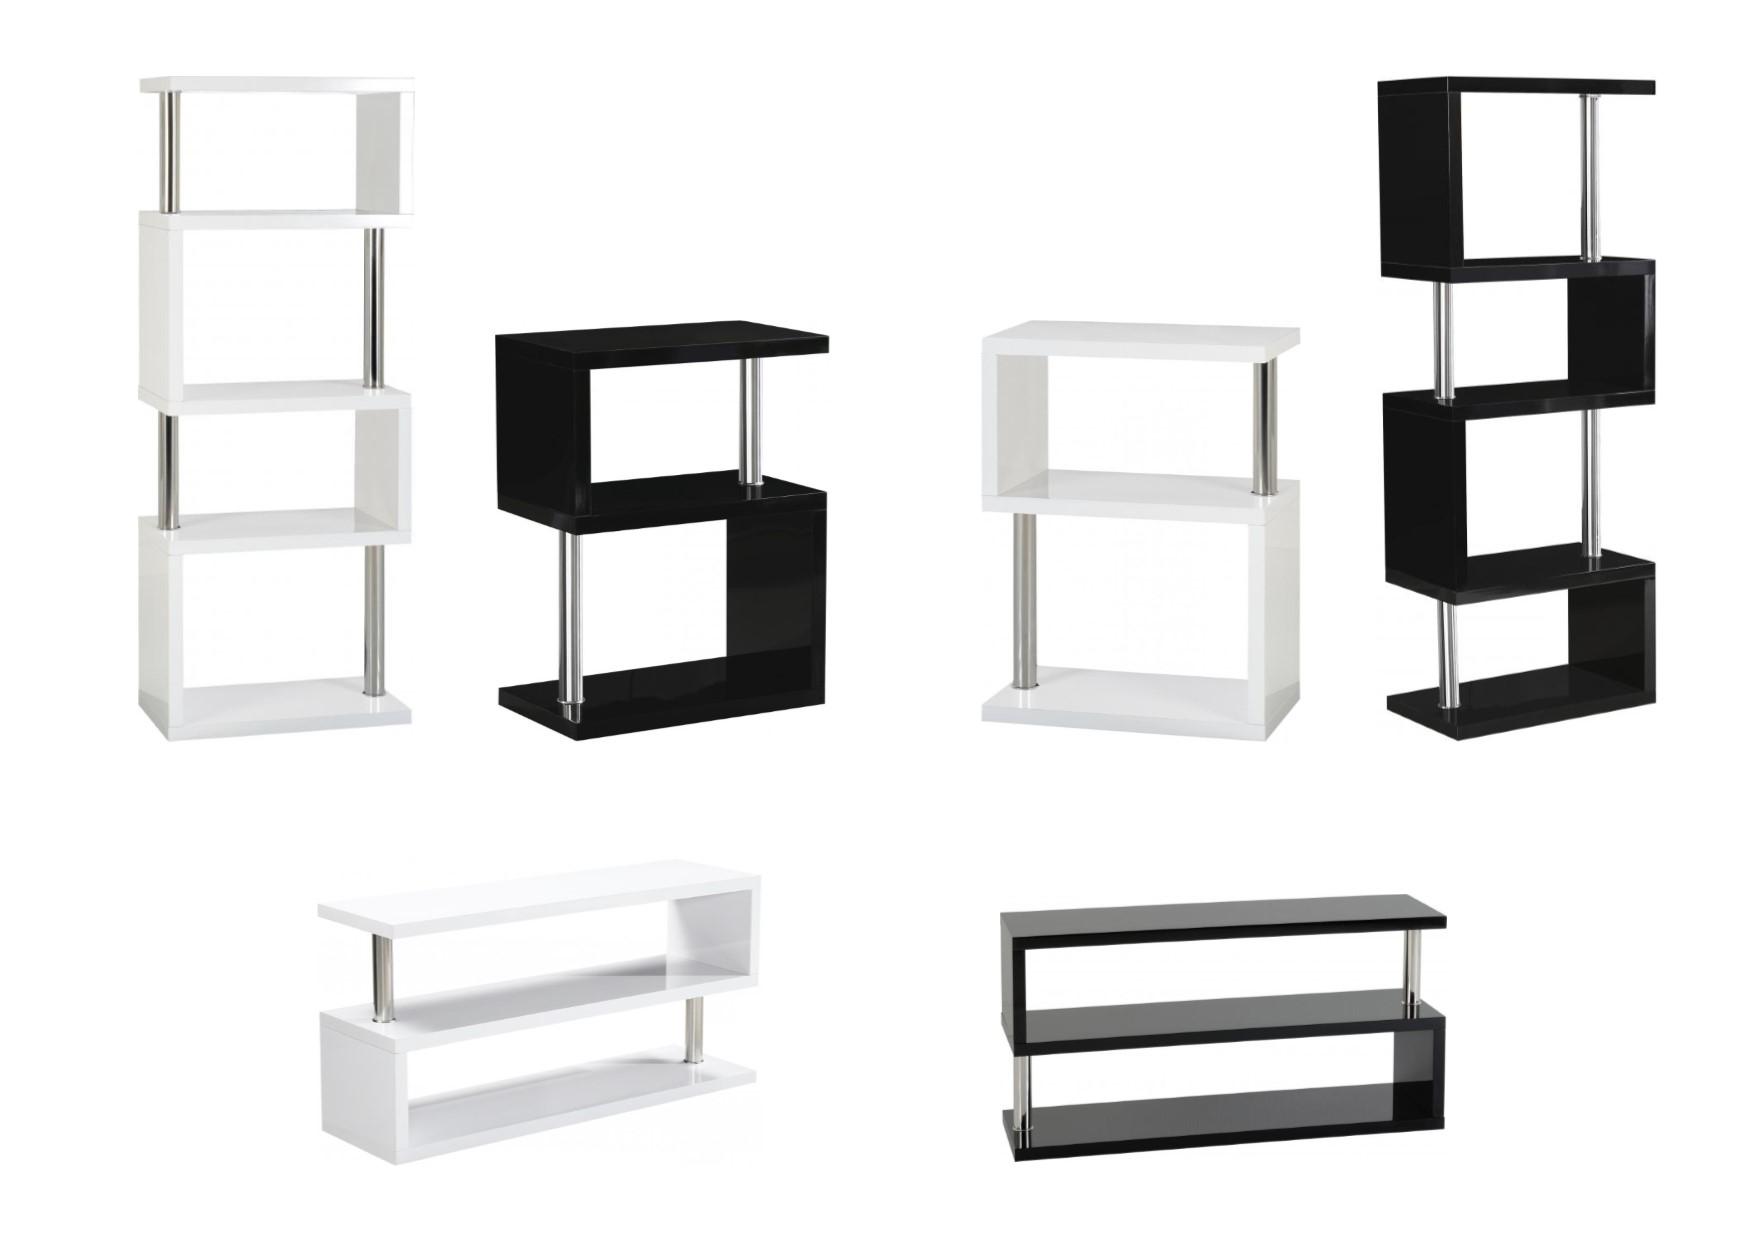 Charisma S Shape Shelves Tv Units Black Or White High Gloss Chrome